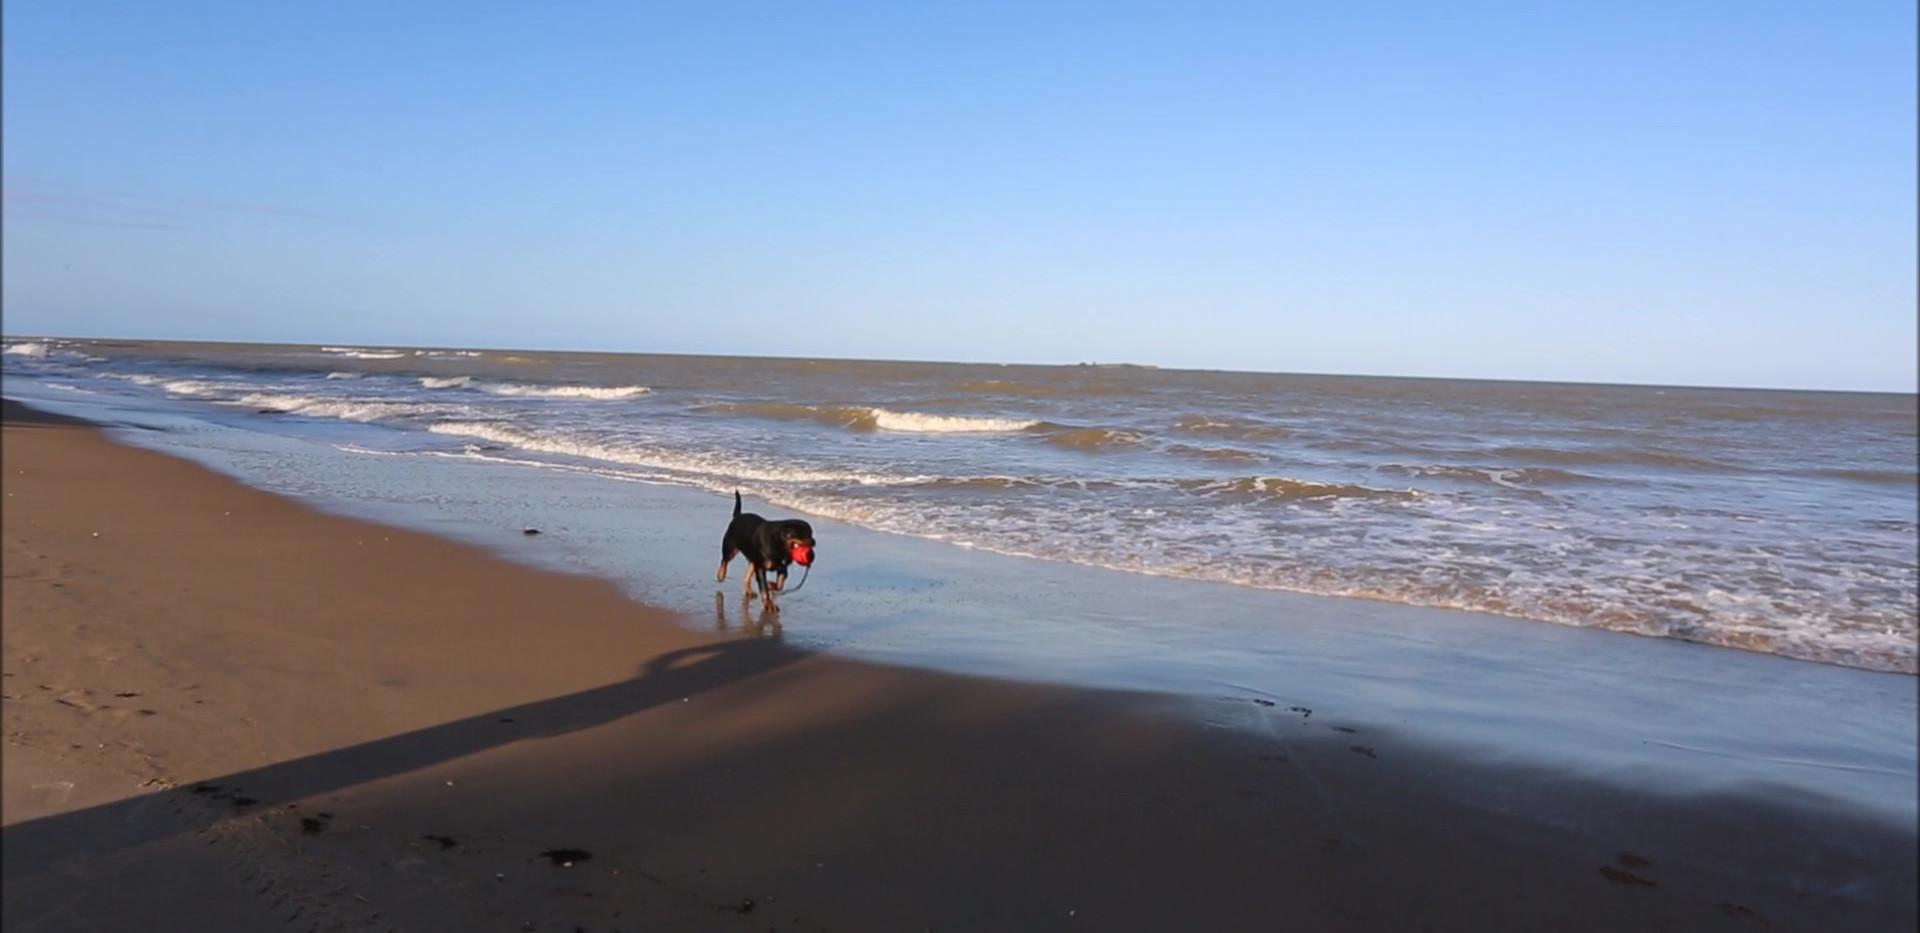 hanna praia site3.mp4